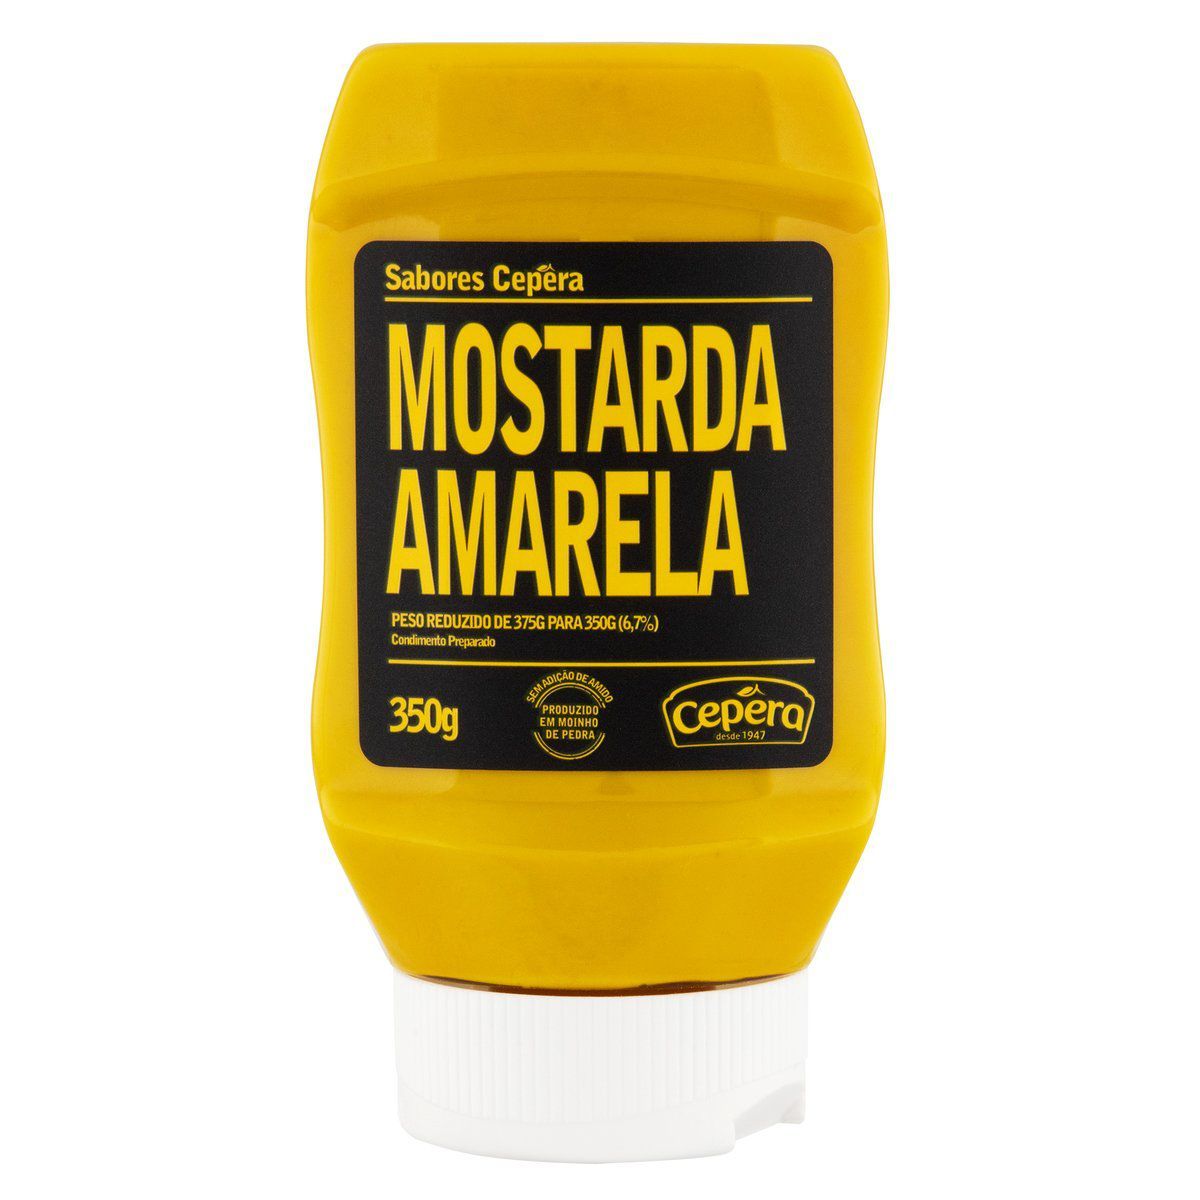 Mostarda Amarela 350g